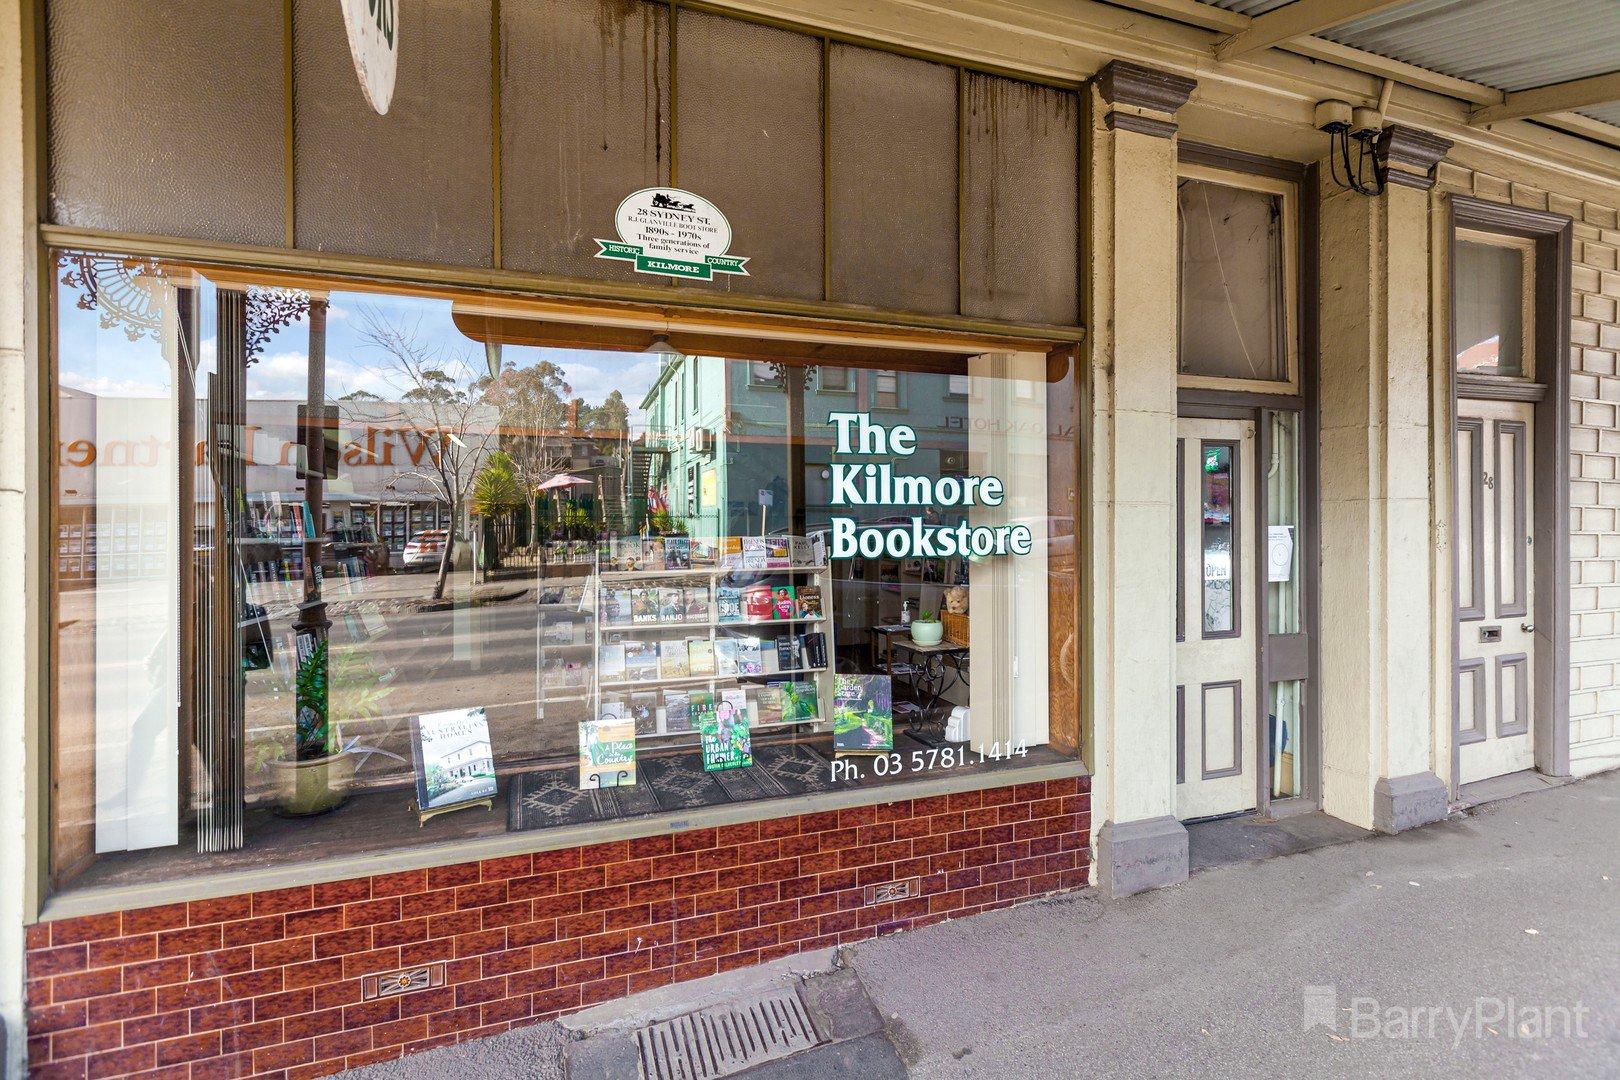 28 Sydney Street, Kilmore, 3764